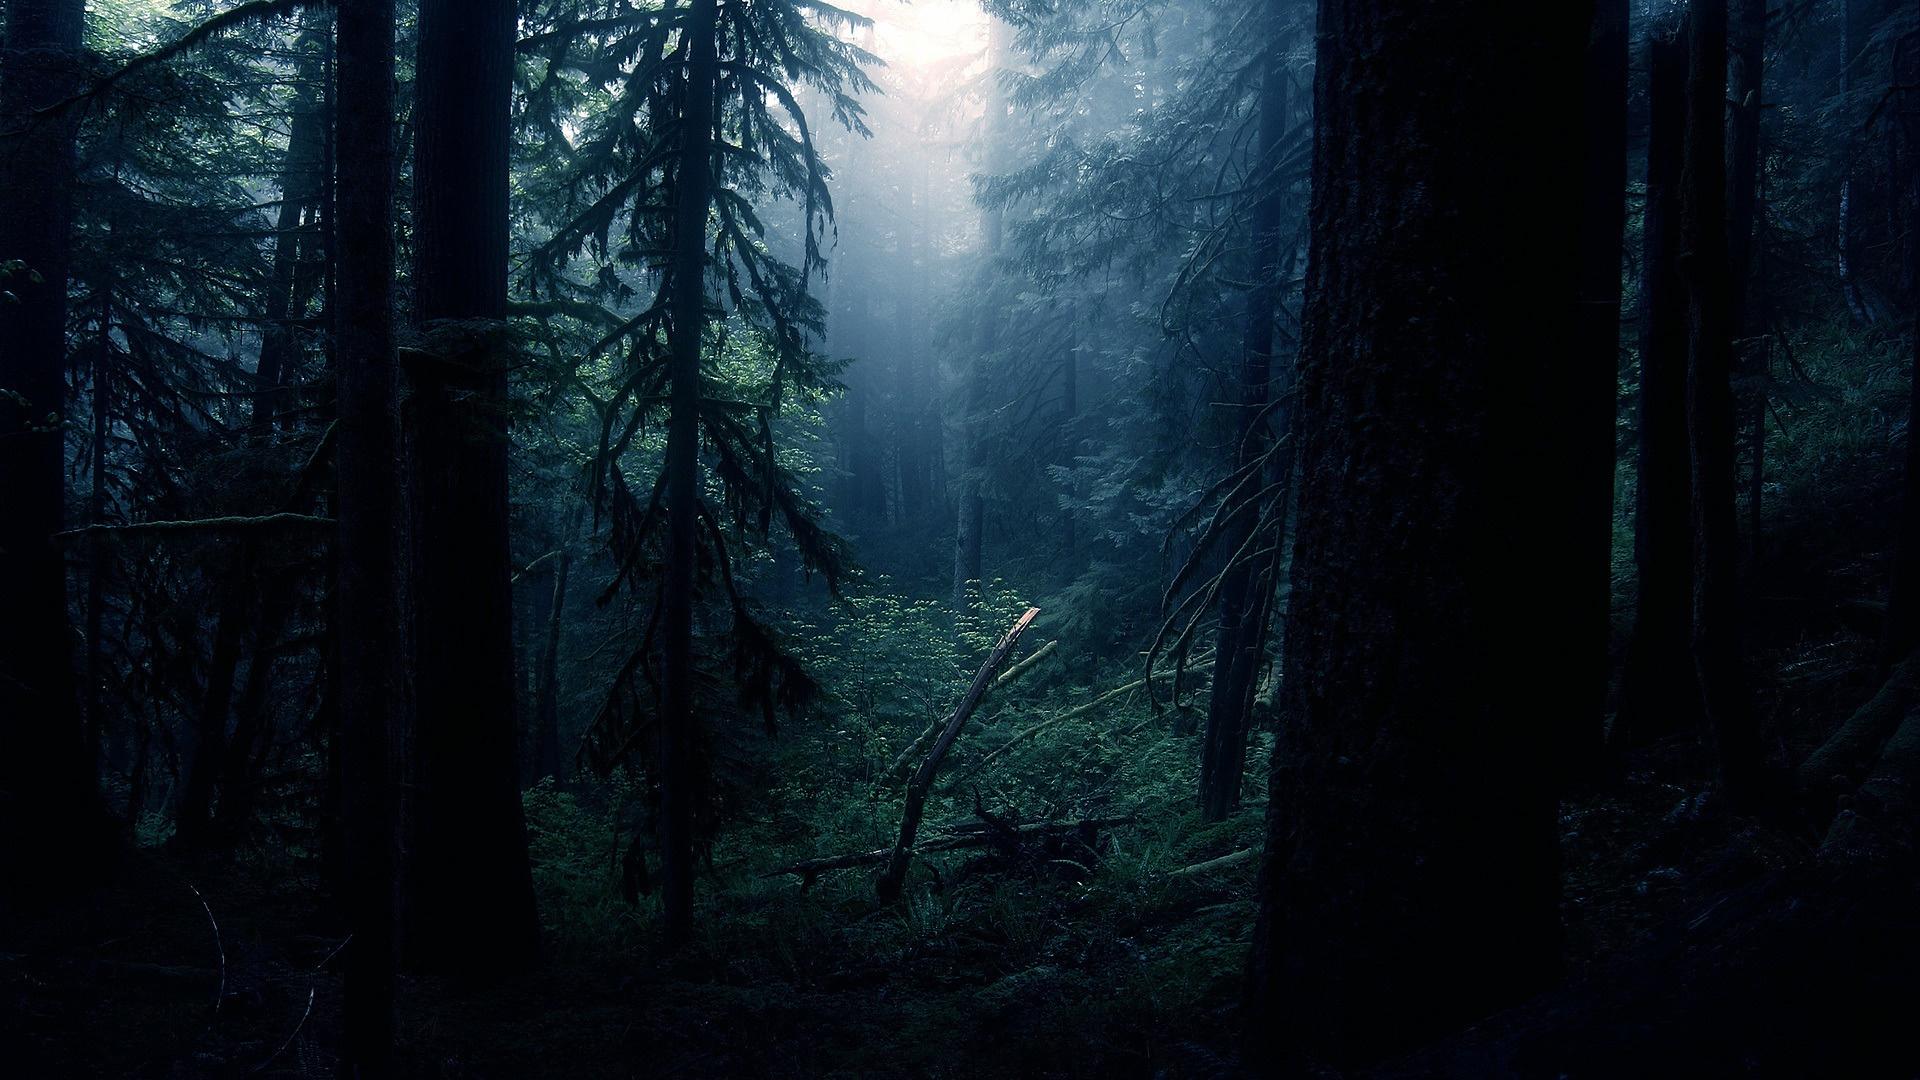 forest wallpaper 1080p